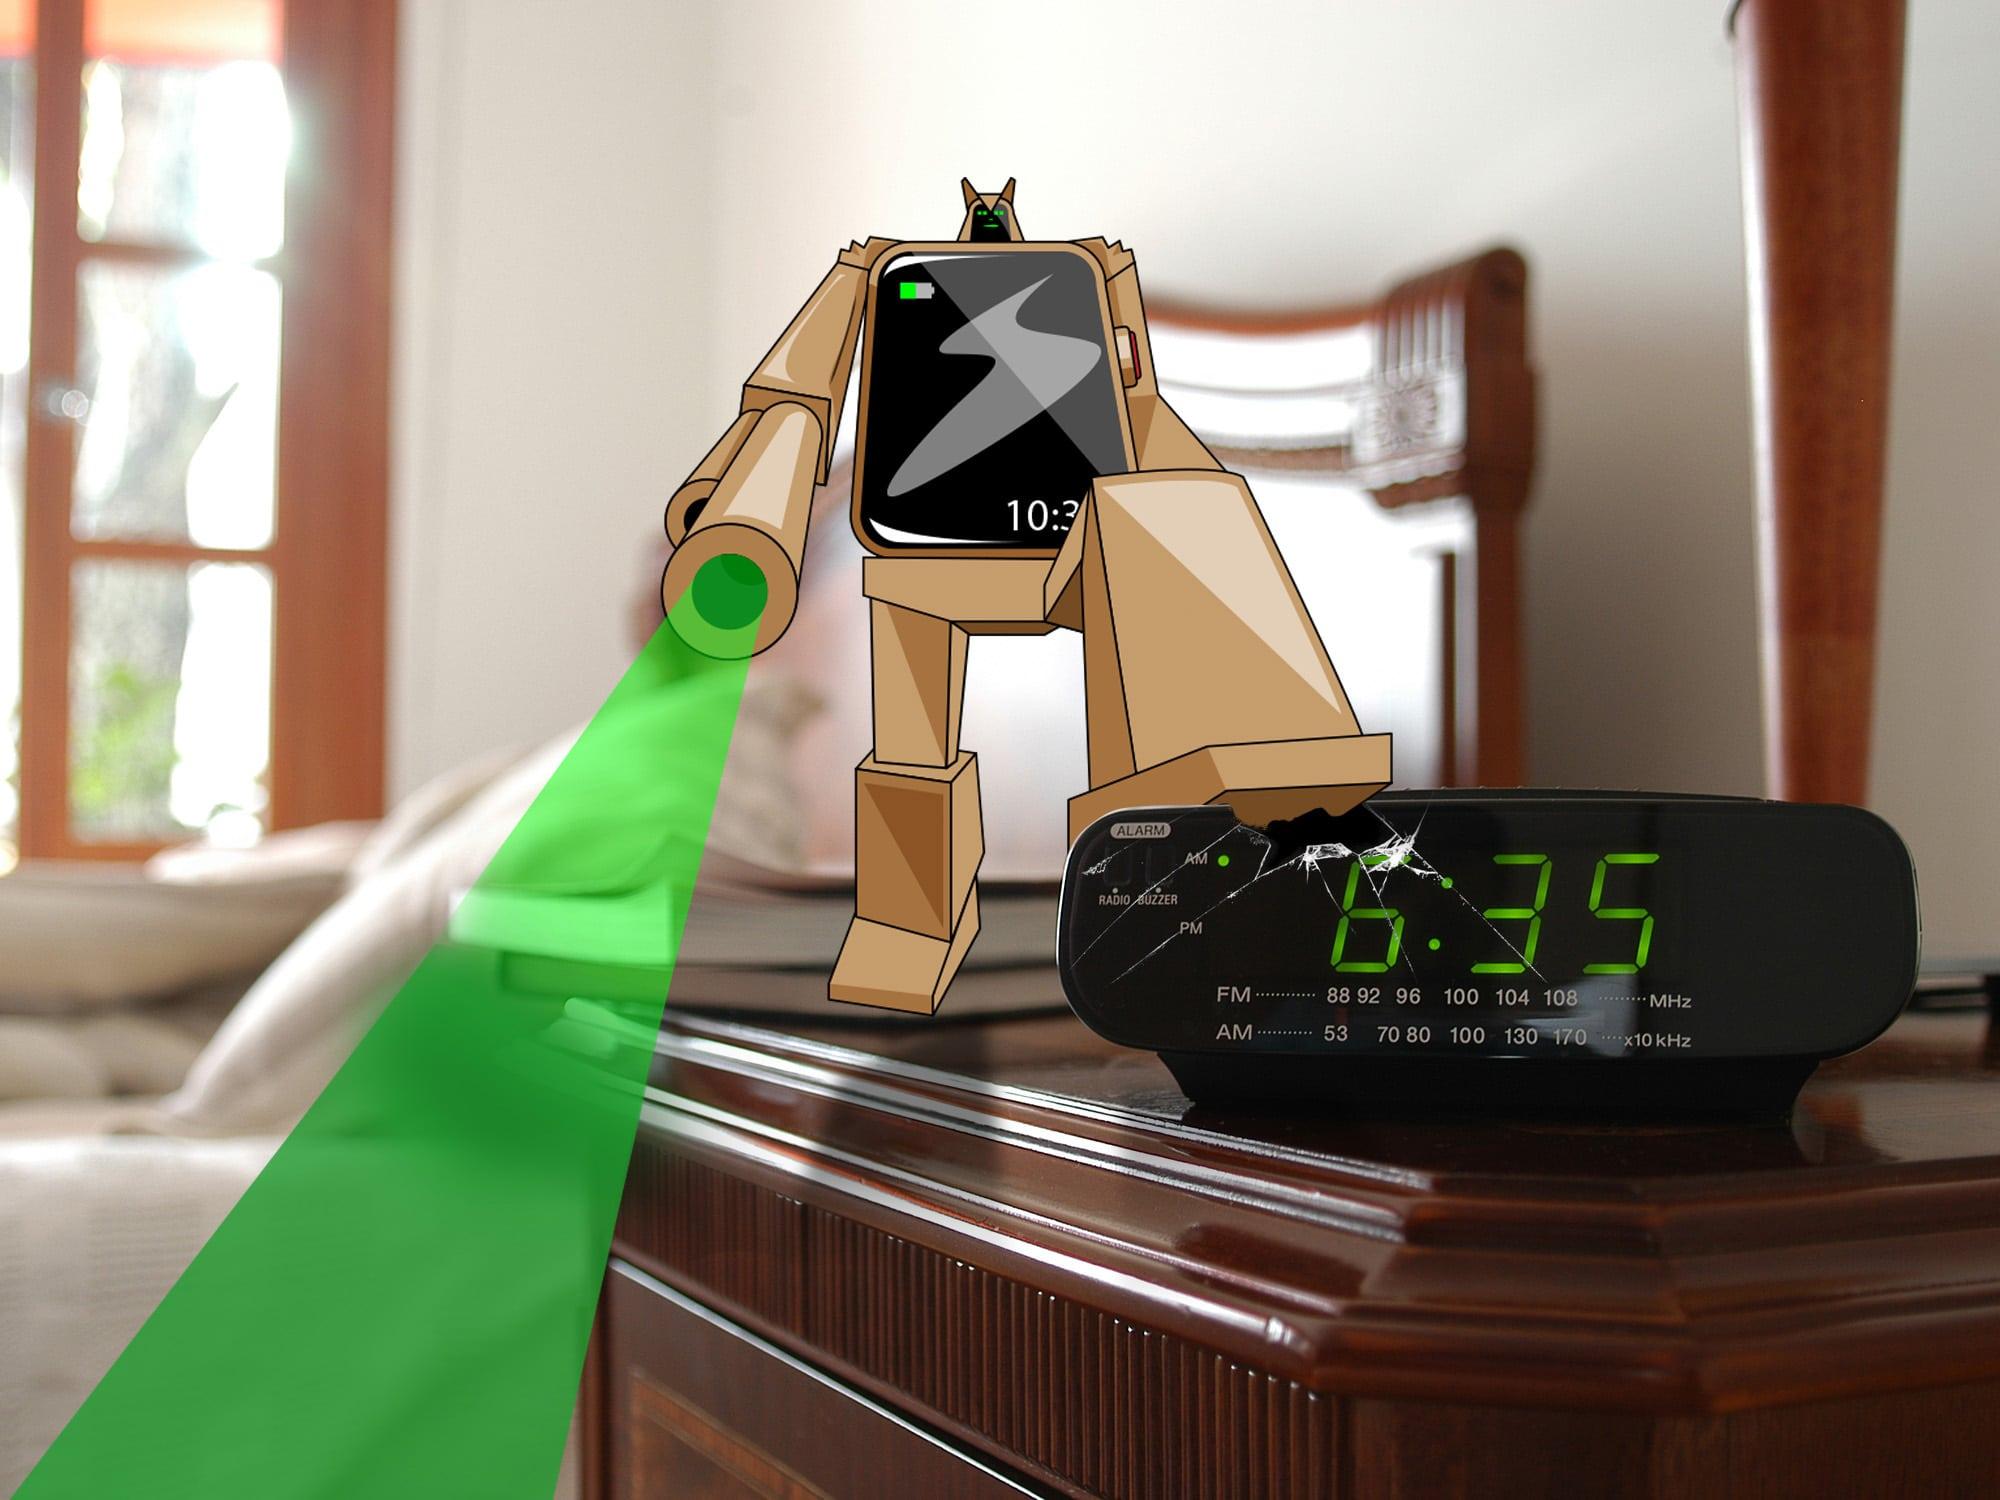 Technology Transformers Apple Watch Situ Image